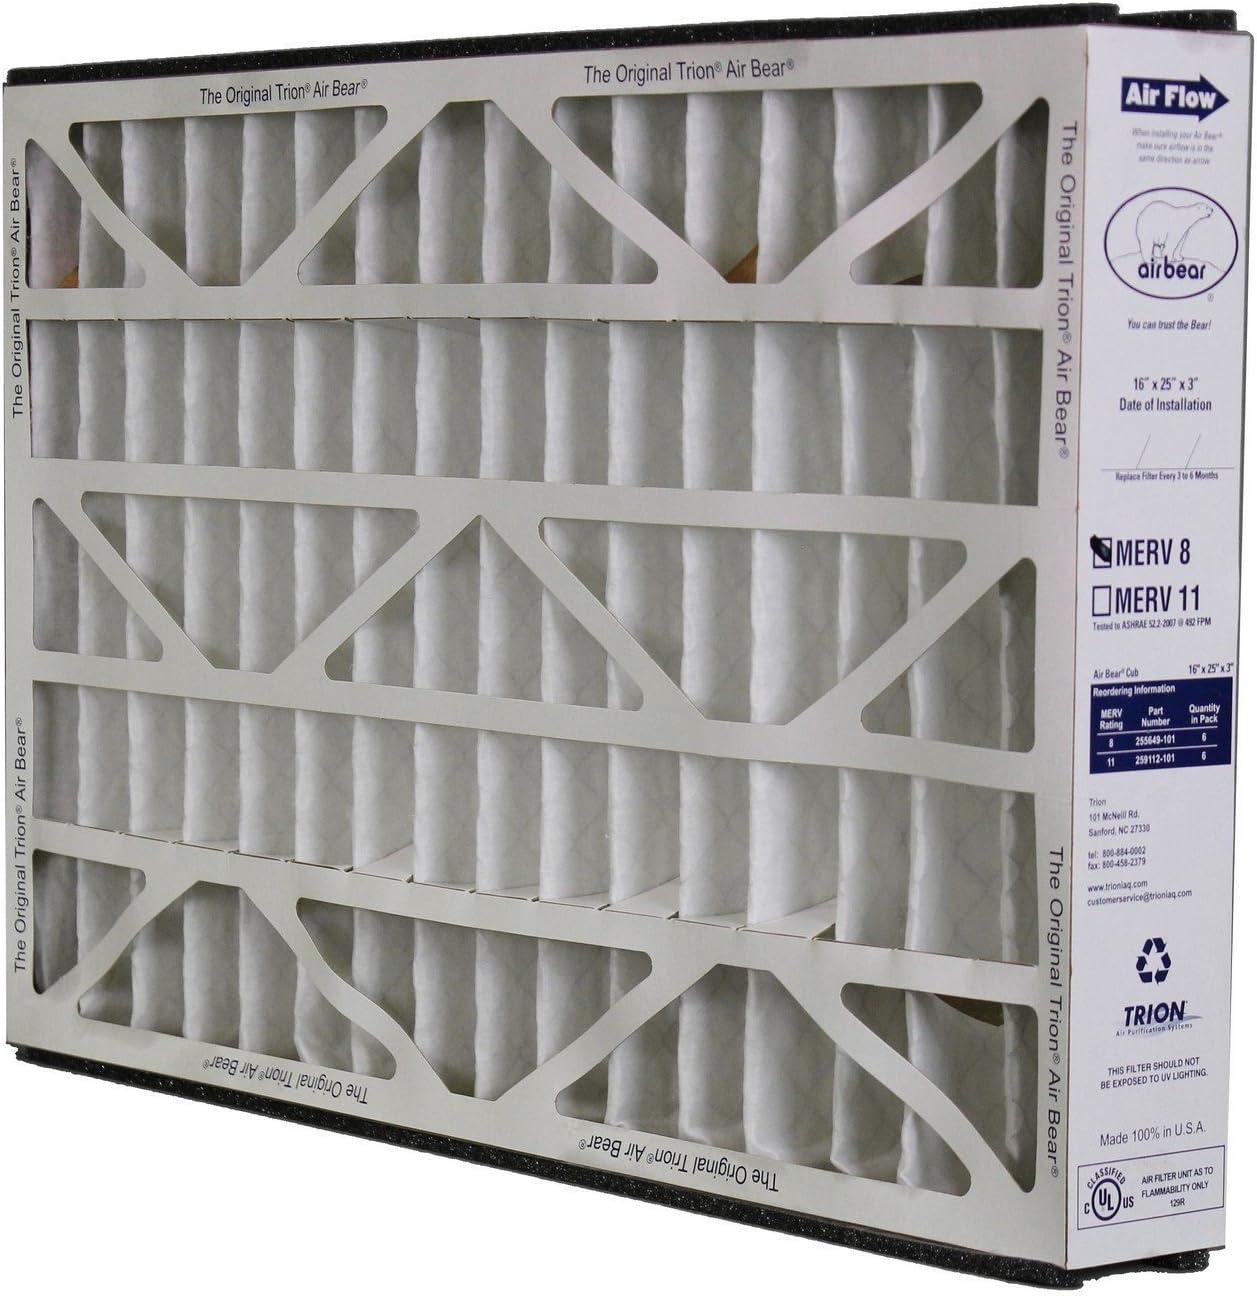 INTERNORMEN MN-01E63040G16EP Direct Interchange for INTERNORMEN-01E63040G16EP Stainless Steel Millennium Filters